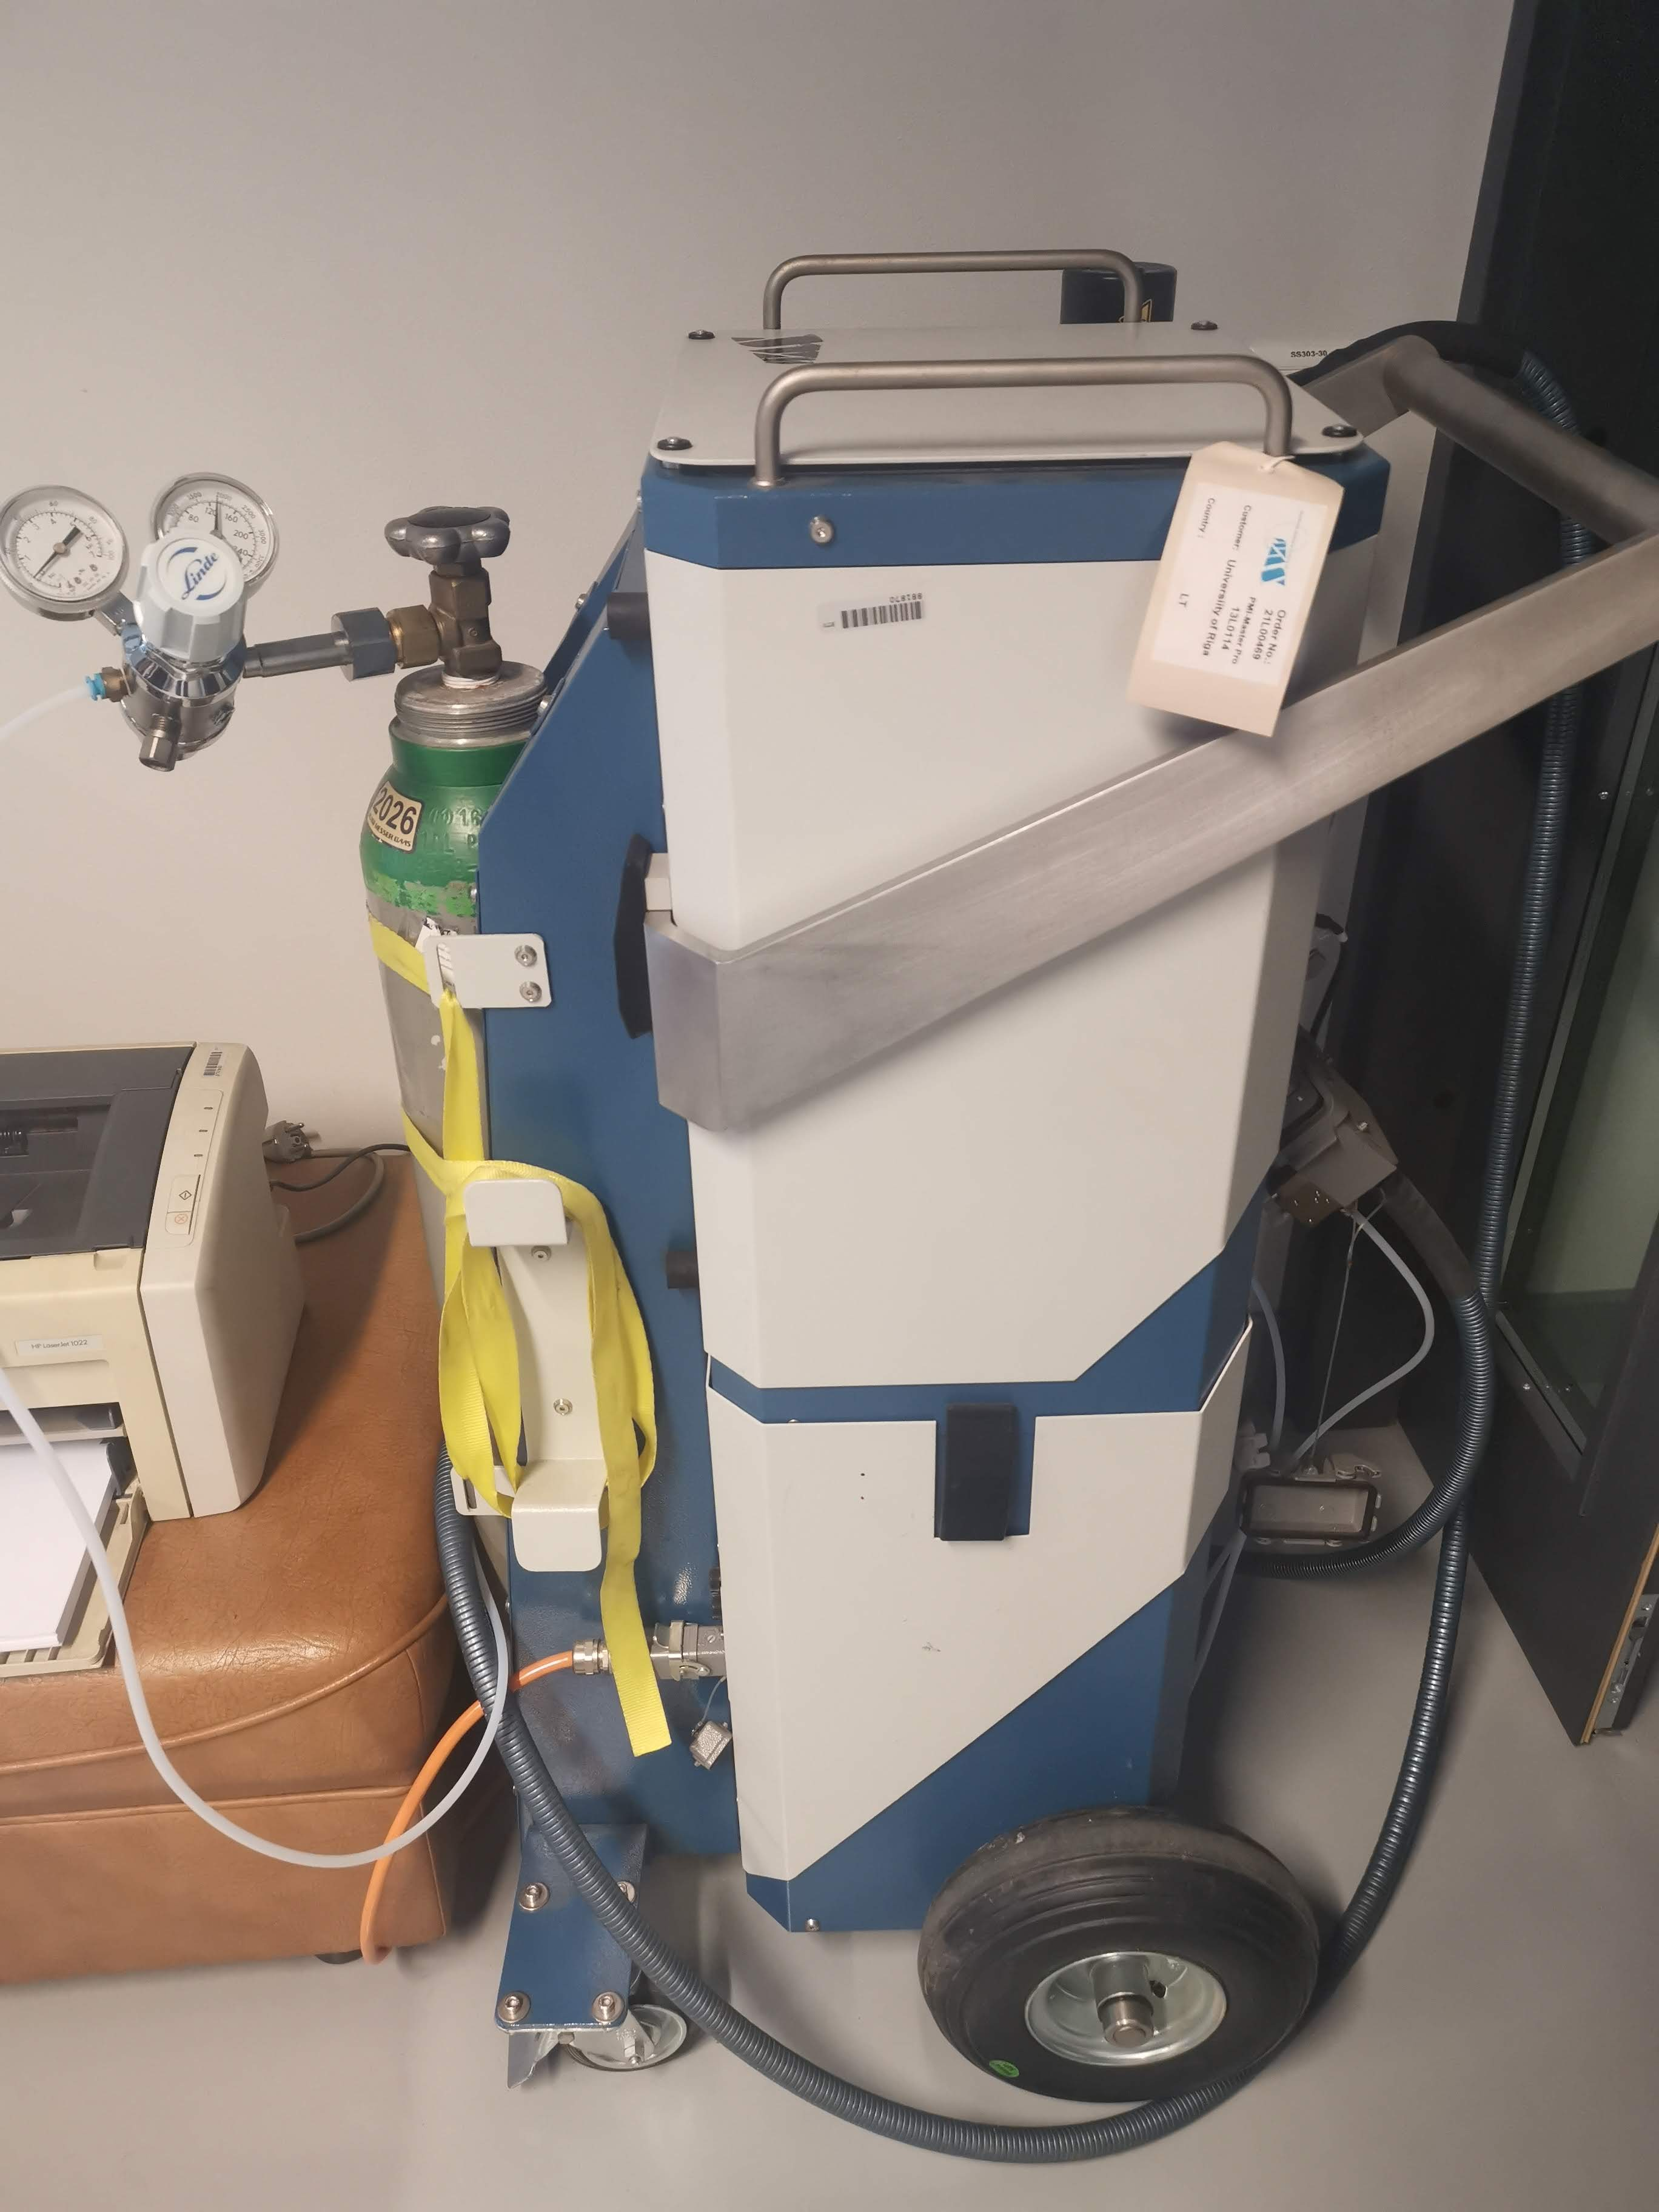 Mobile optical emission spectrometer for metal analysis  PMI MASTER PRO 13L0114